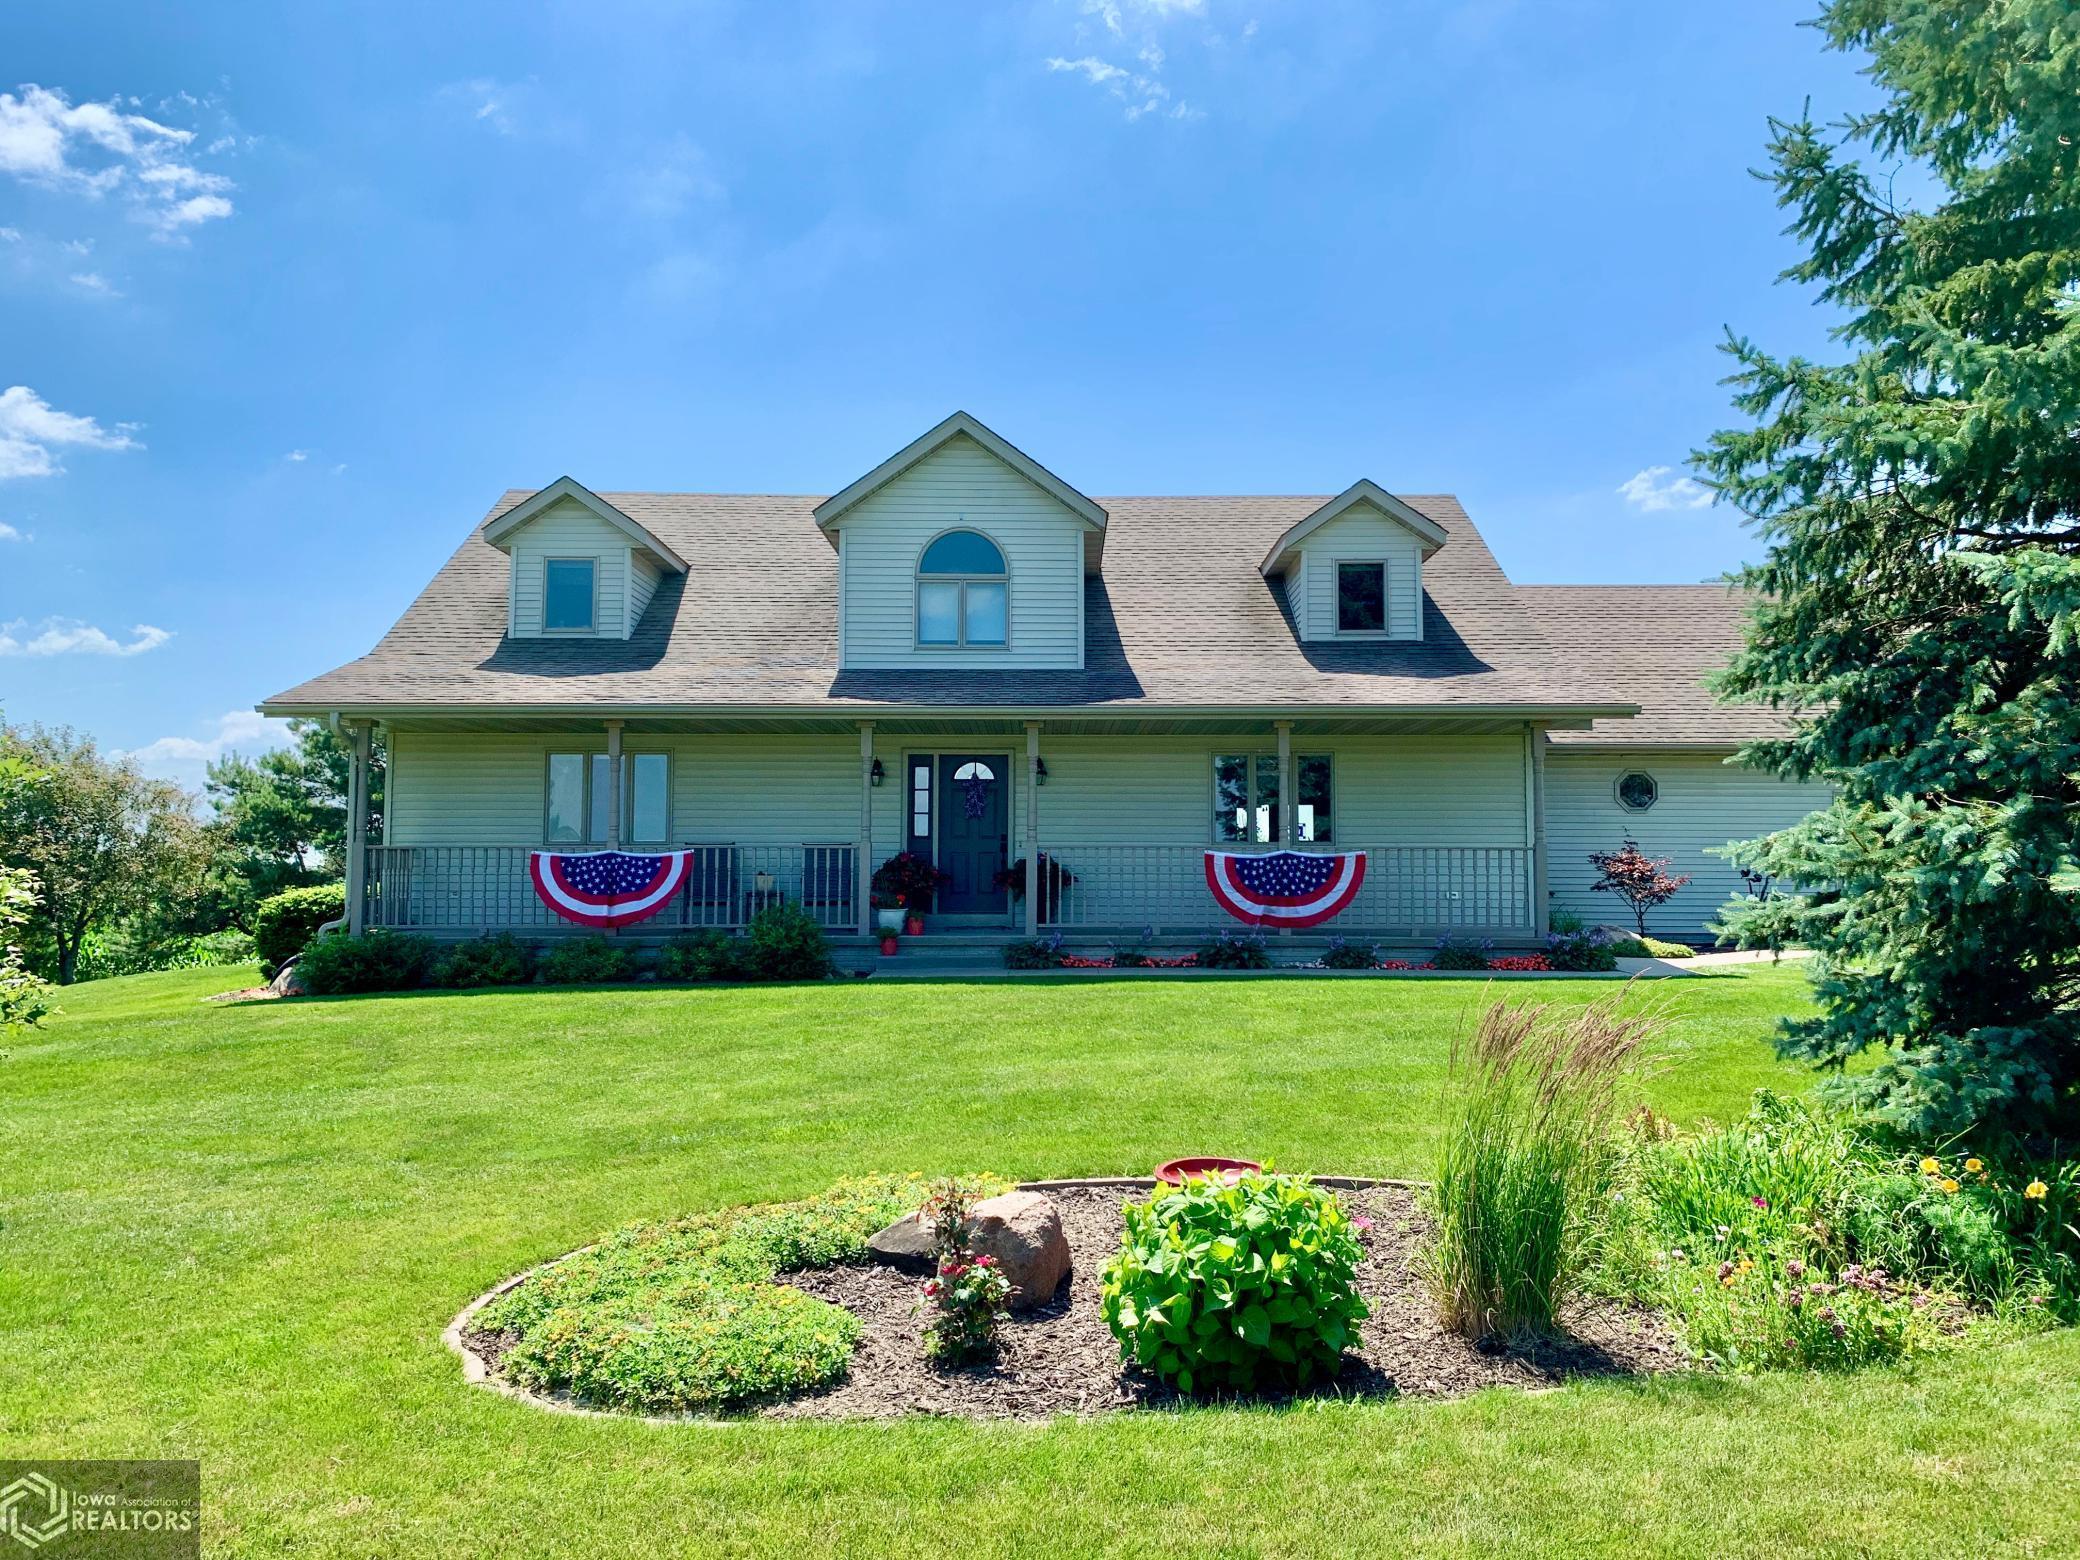 256 Newburg, Grinnell, Iowa 50112-8306, 4 Bedrooms Bedrooms, ,2 BathroomsBathrooms,Single Family,For Sale,Newburg,5726109